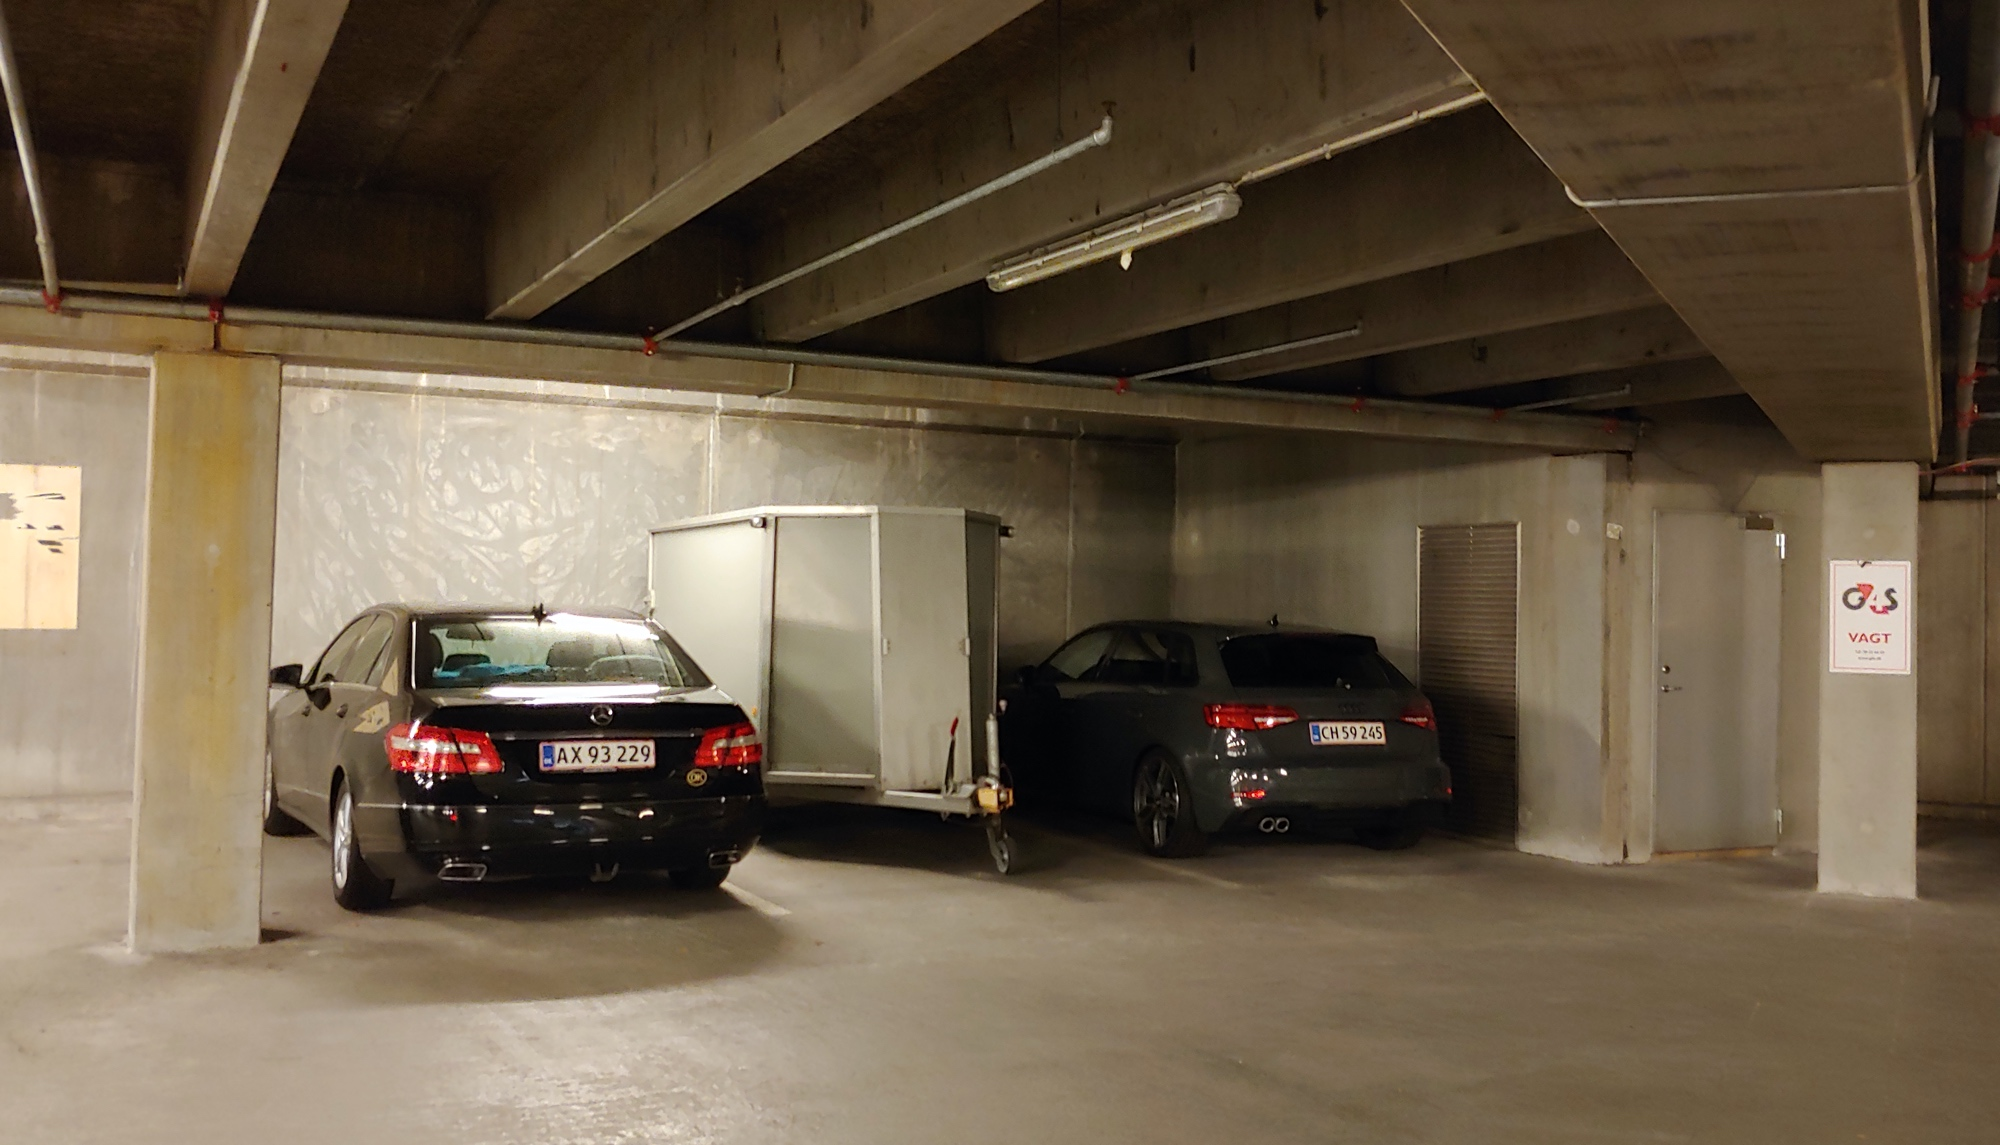 Extreme parking 4.jpg